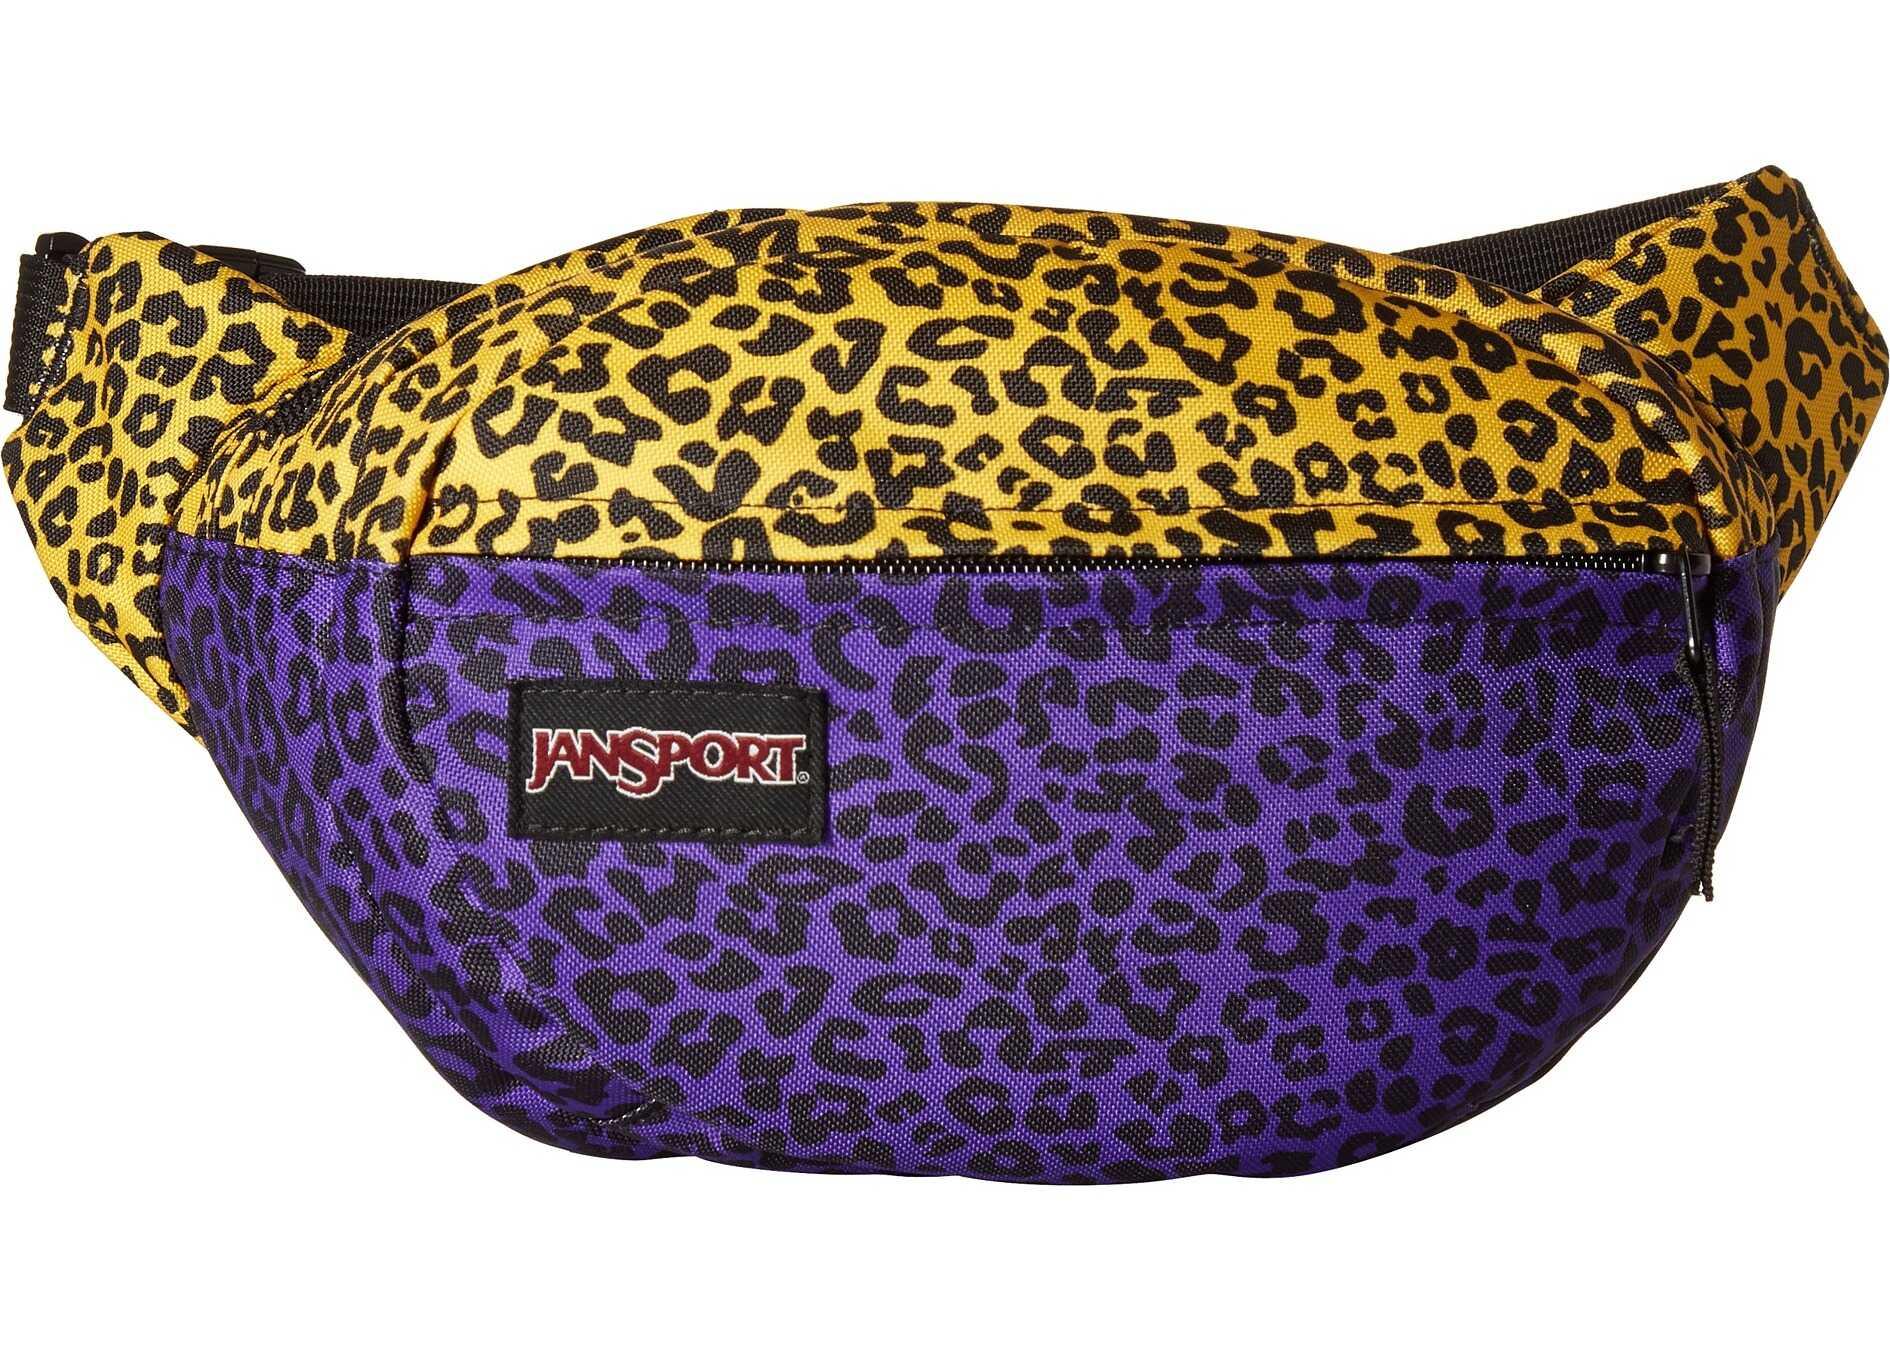 JanSport Fifth Avenue Purple Leopard Life